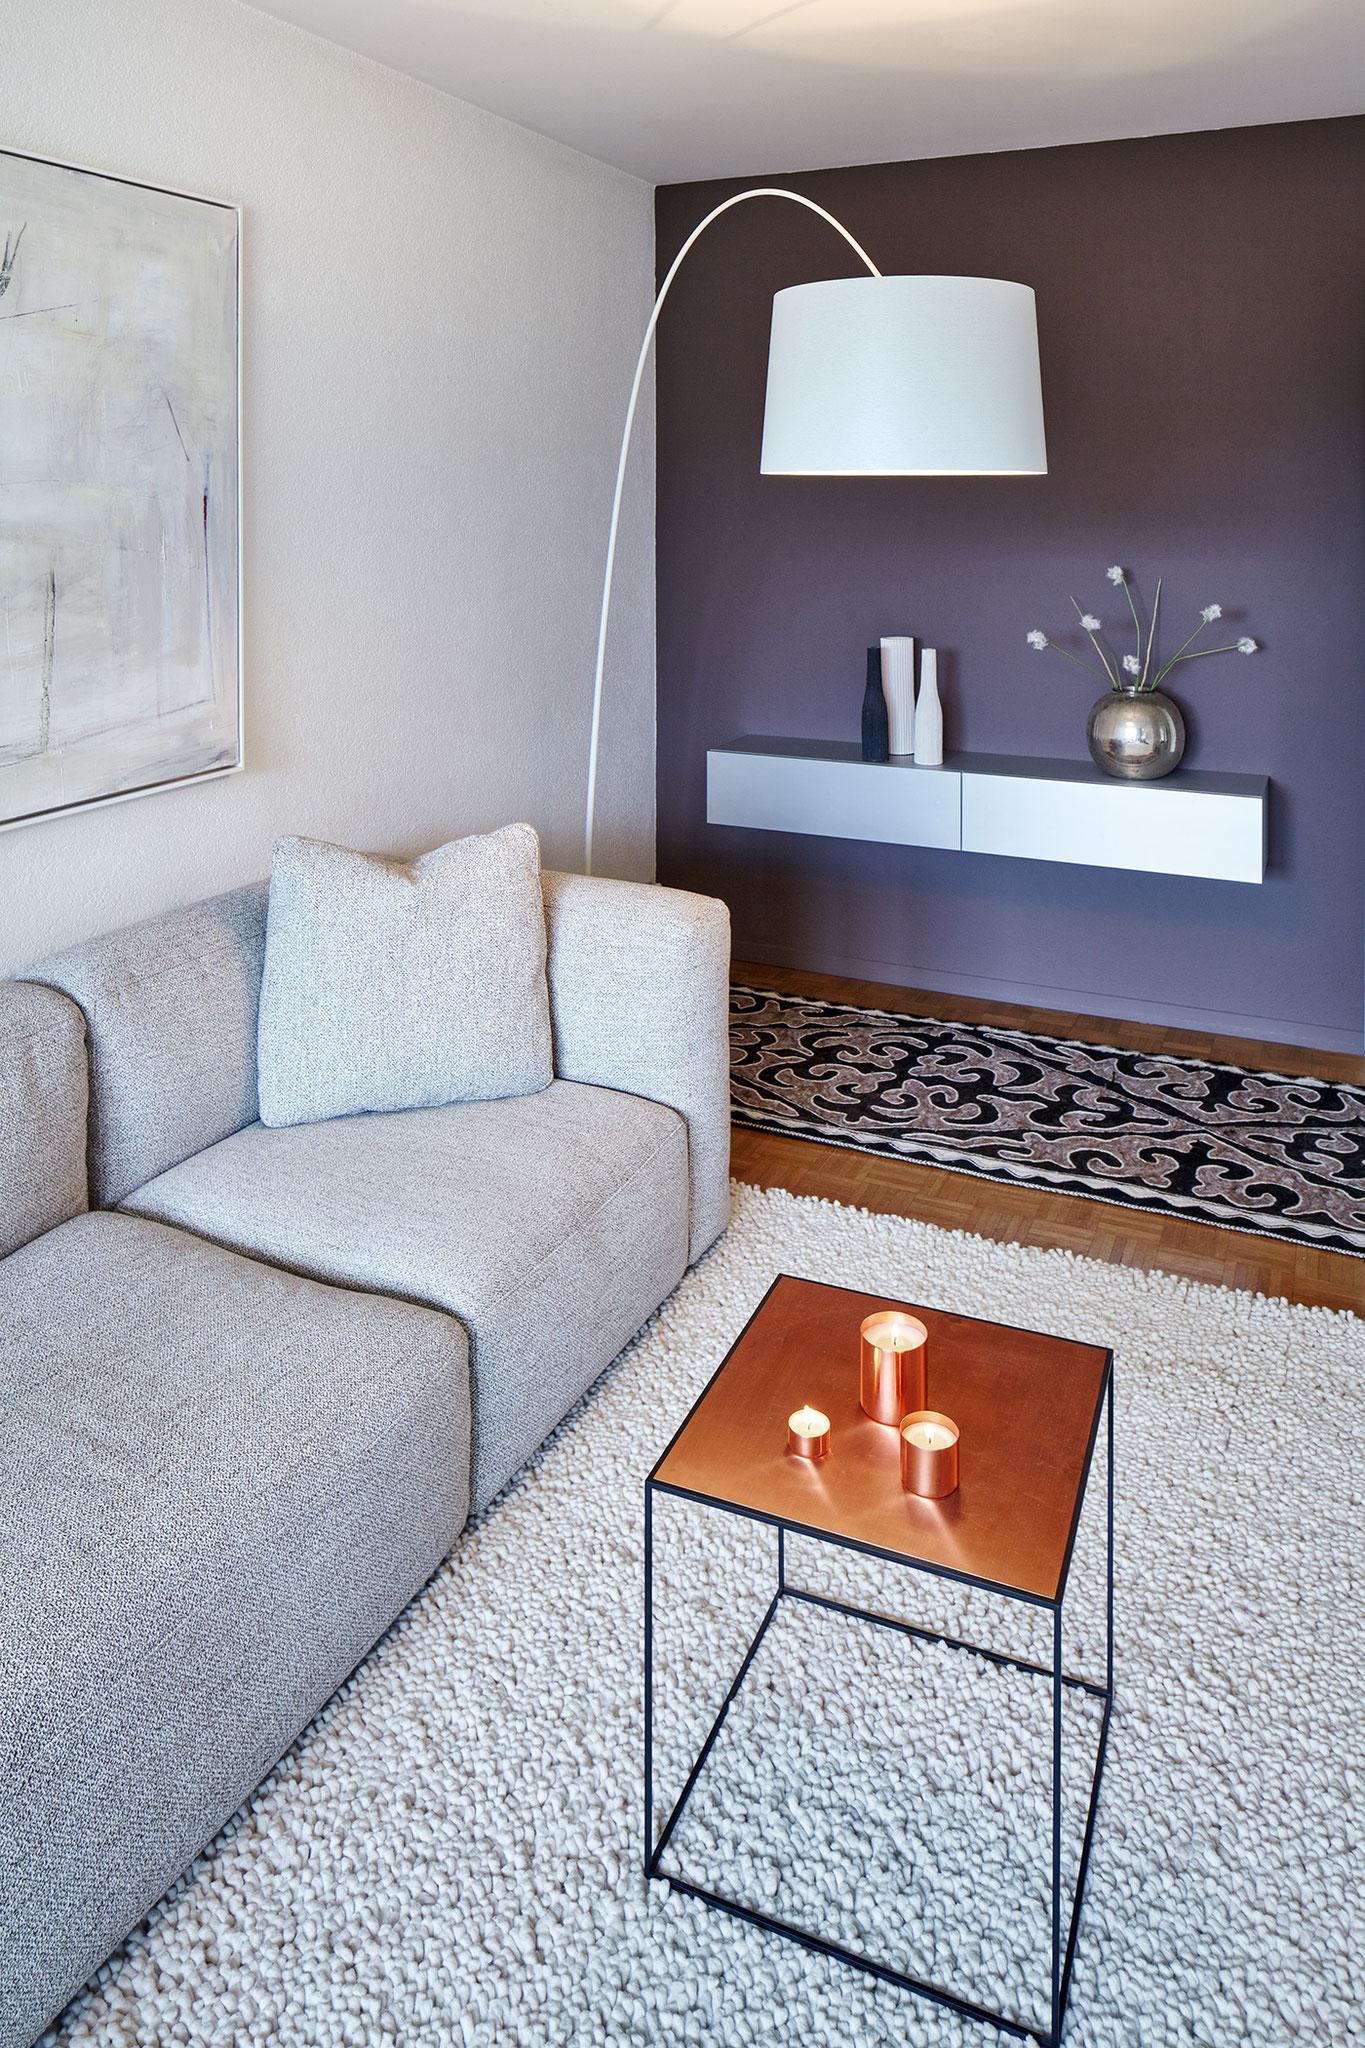 5,5-Room Apartment Höngg